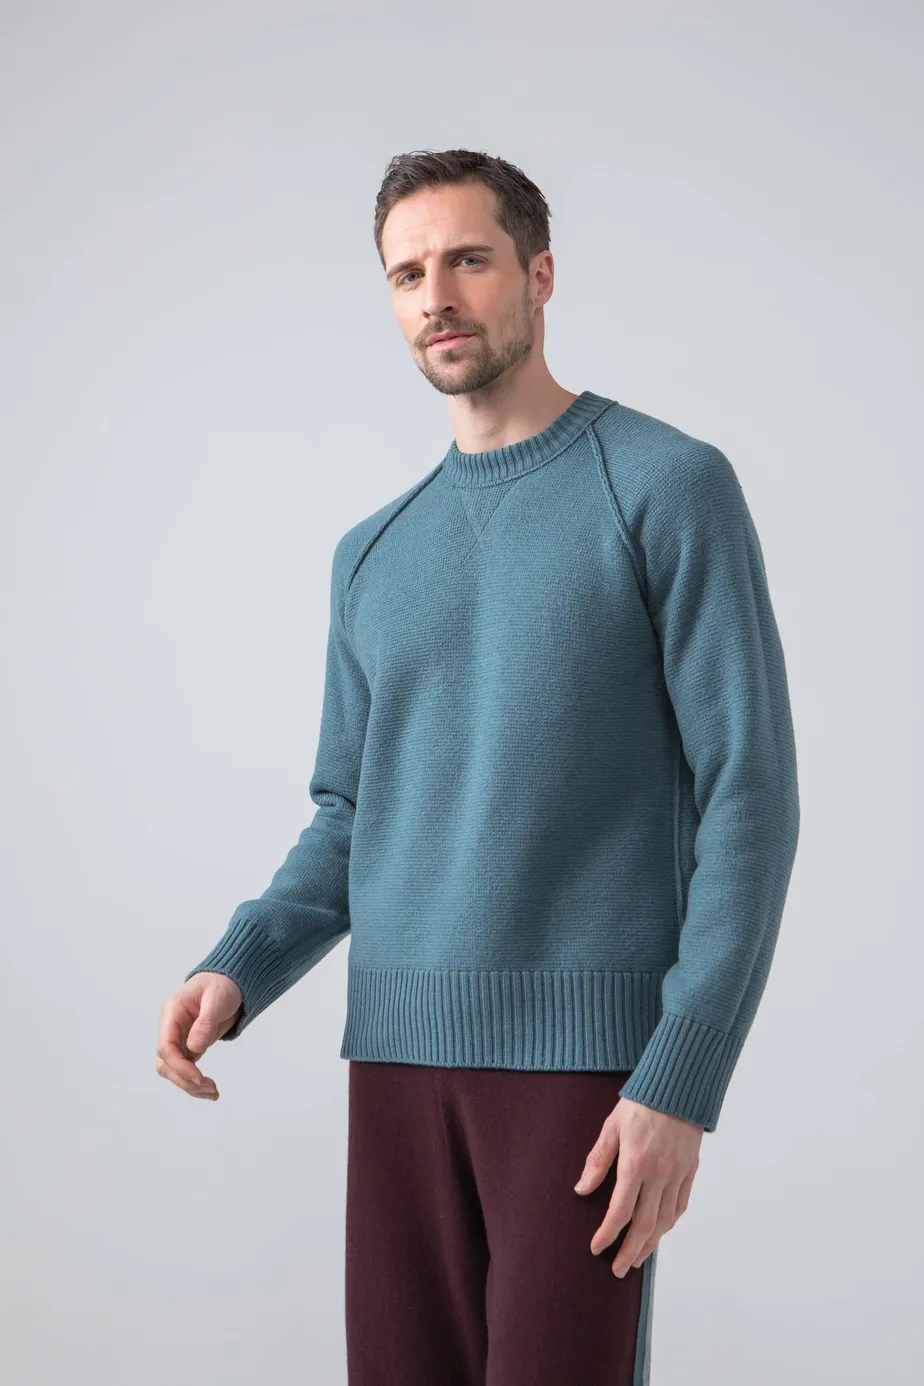 Reversible Slouchy Fleece Slate Men S Cashmere Sweatshirt Johnstons Of Elgin In 2021 Cashmere Sweater Men Mens Cashmere Cashmere Loungewear [ 1386 x 924 Pixel ]